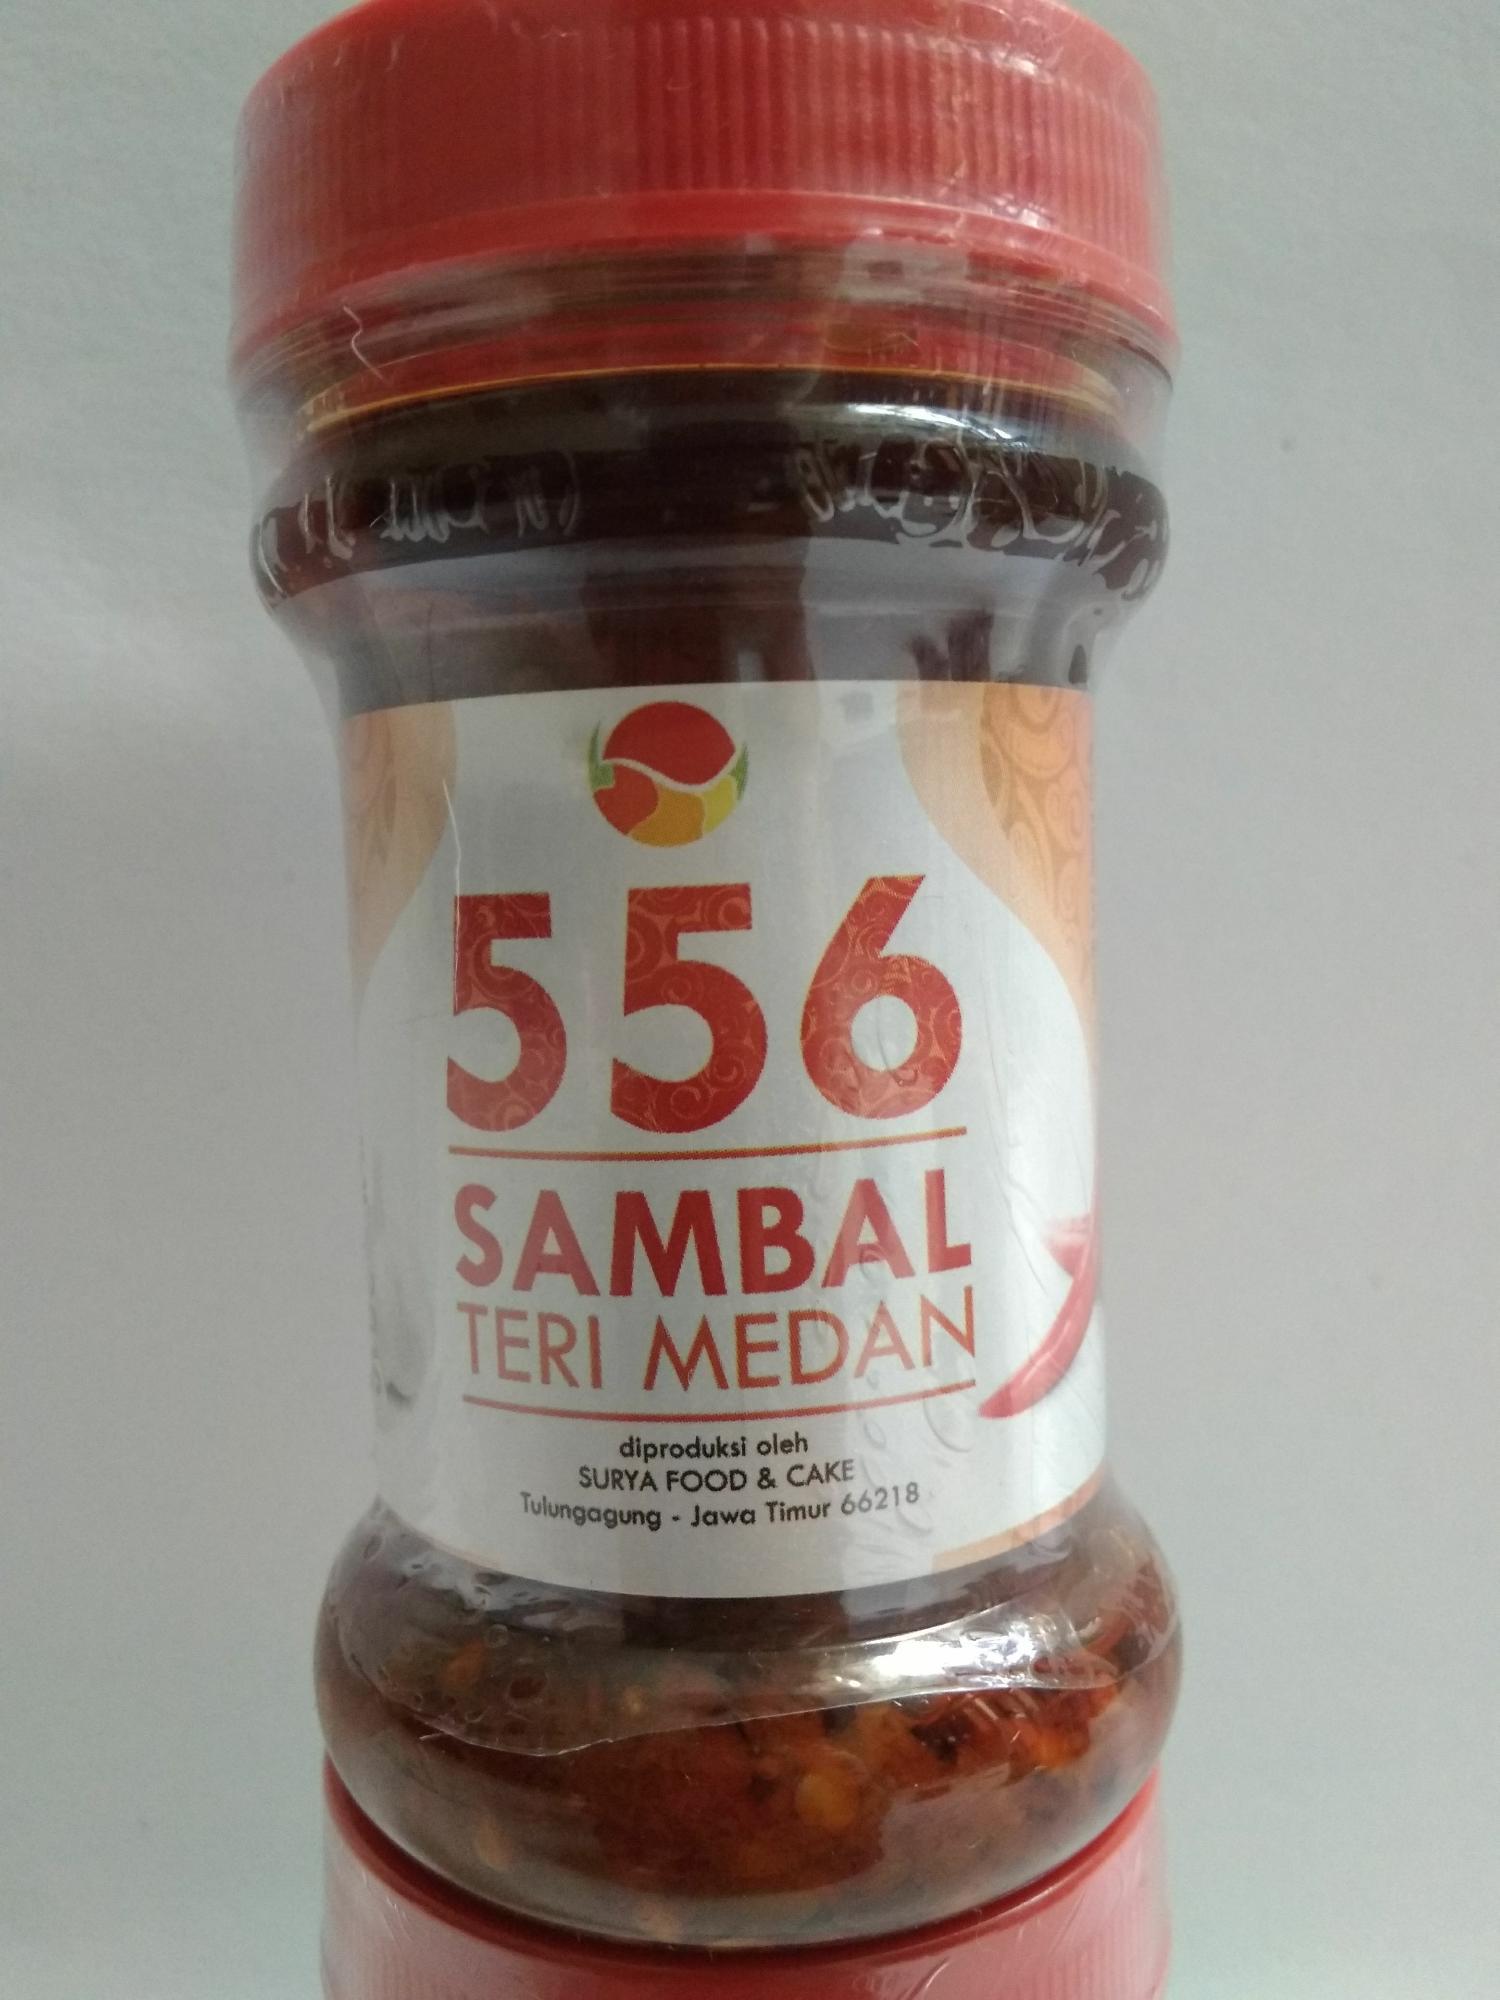 Sambal Teri Kacang By Rumah Giling 556